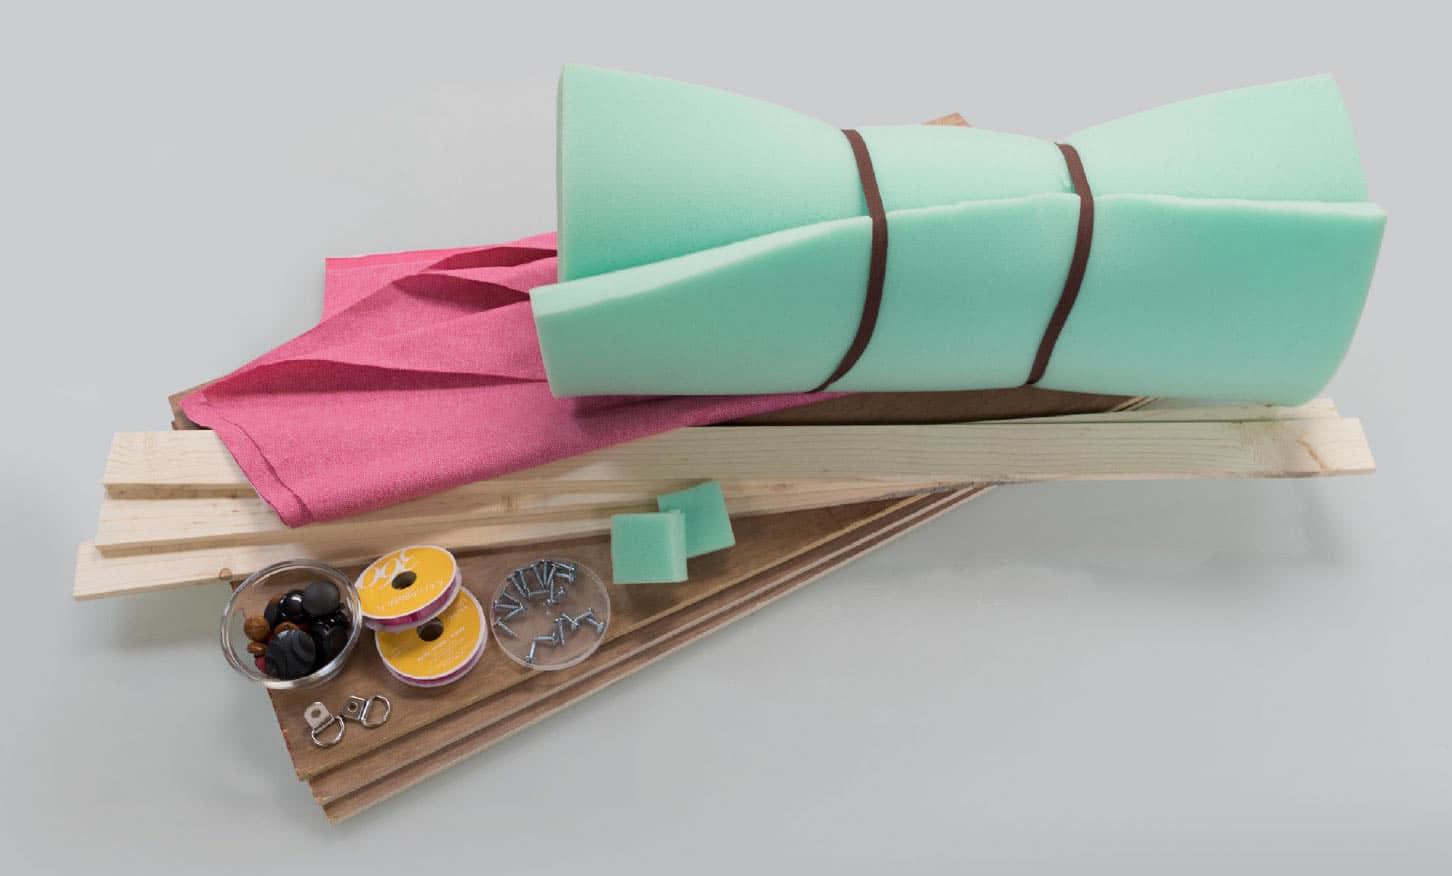 trellis-inspired-headboard-arrow-project-supplies